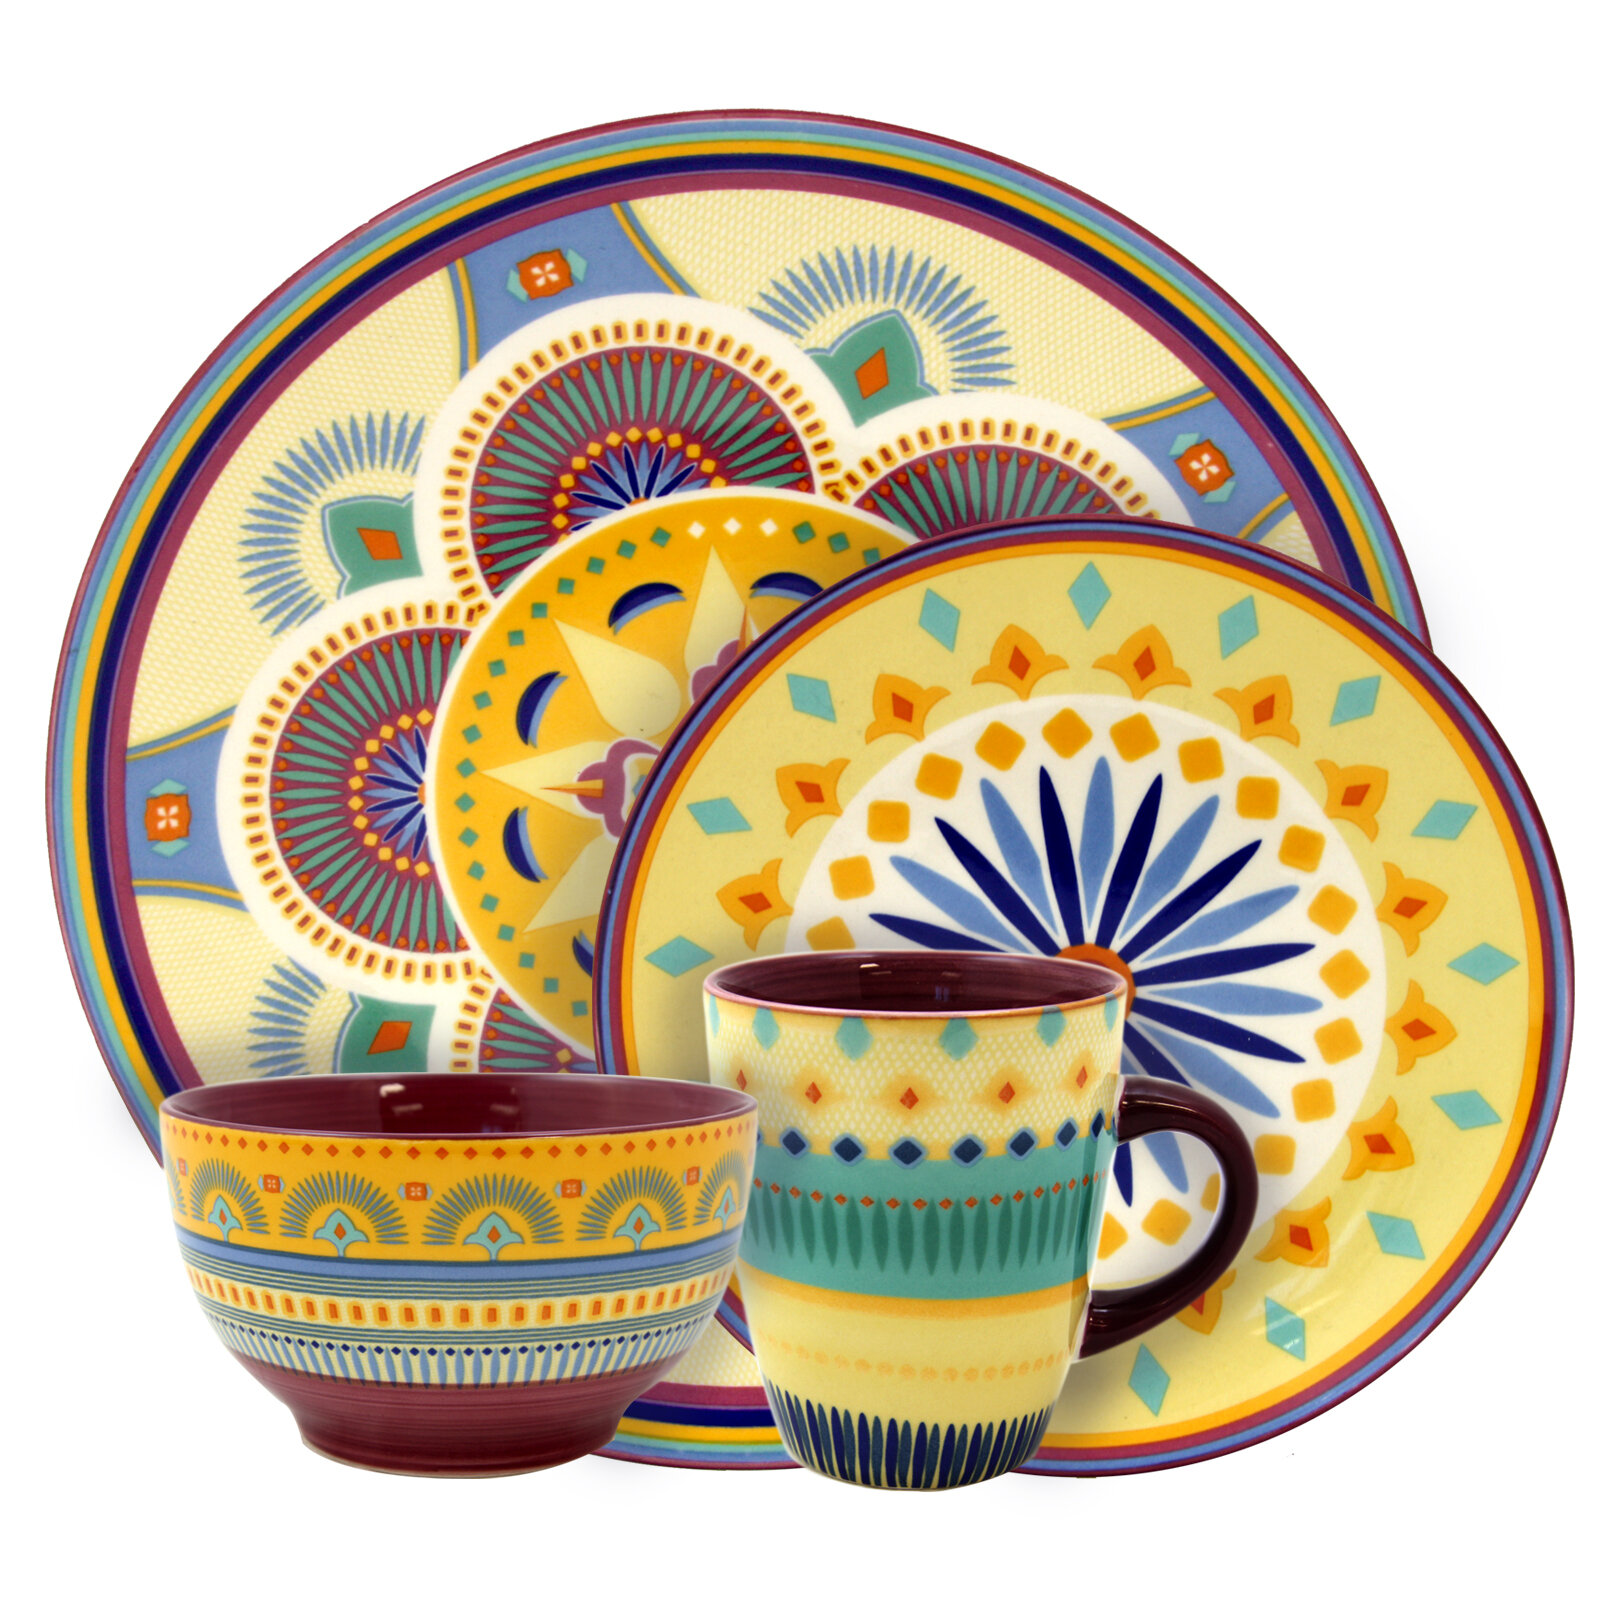 Bloomsbury Market Perkins Stoneware 16 Piece Dinnerware Set Service for 4 u0026 Reviews | Wayfair  sc 1 st  Wayfair & Bloomsbury Market Perkins Stoneware 16 Piece Dinnerware Set Service ...